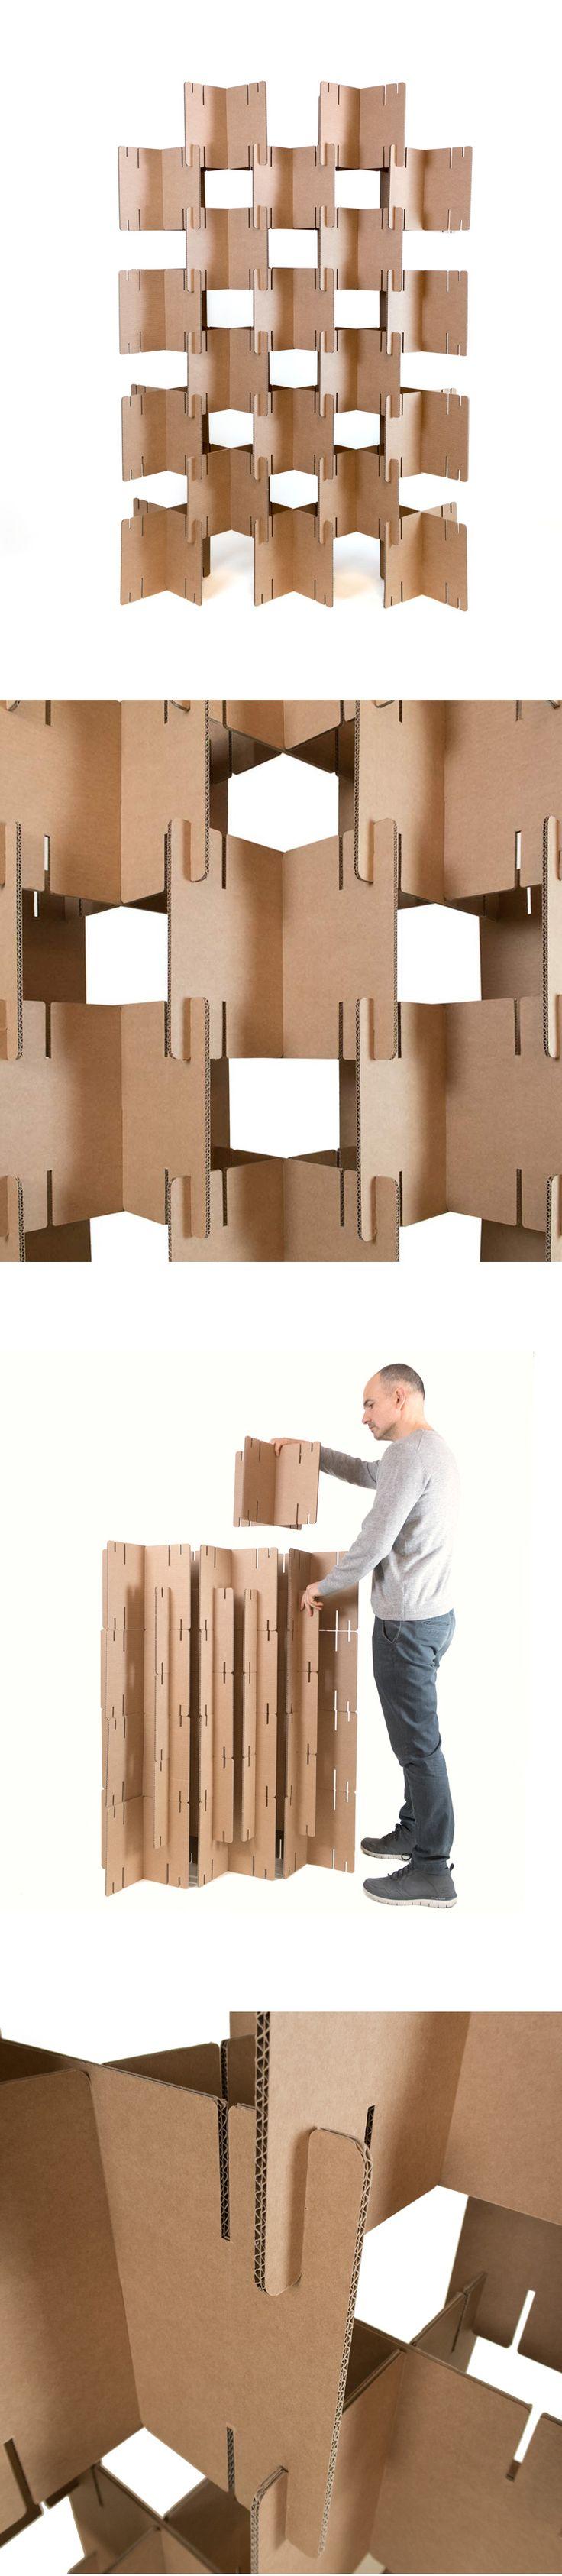 Biombo de cart n modular furniture cardboard muebles - Biombo de carton ...